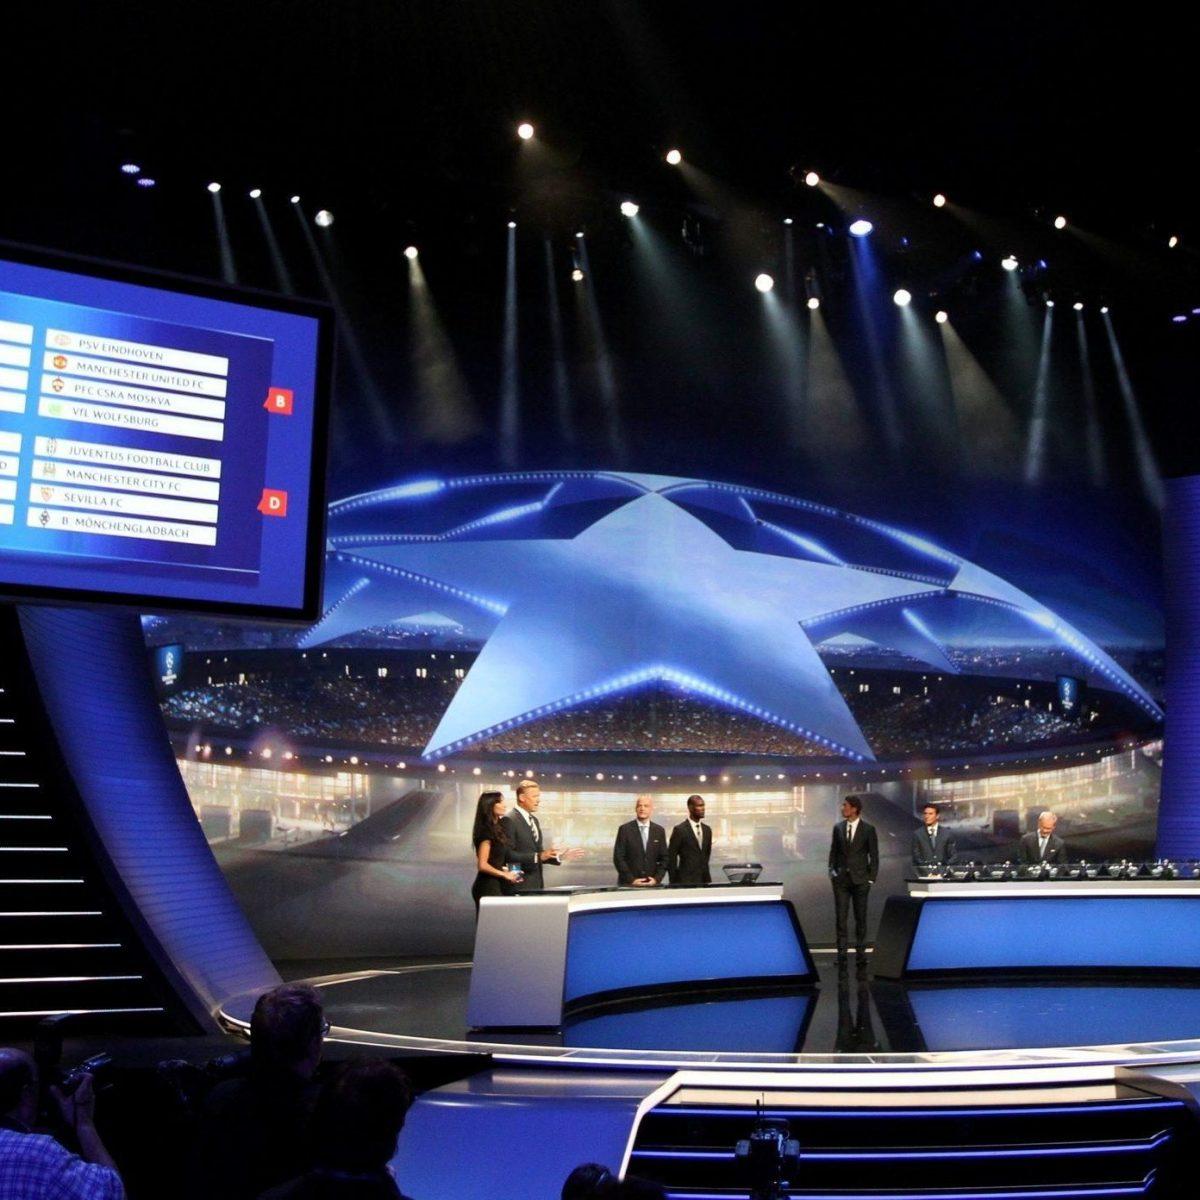 sorteggio gironi champions league 2020 2021 fasce e squadre qualificate sorteggio gironi champions league 2020